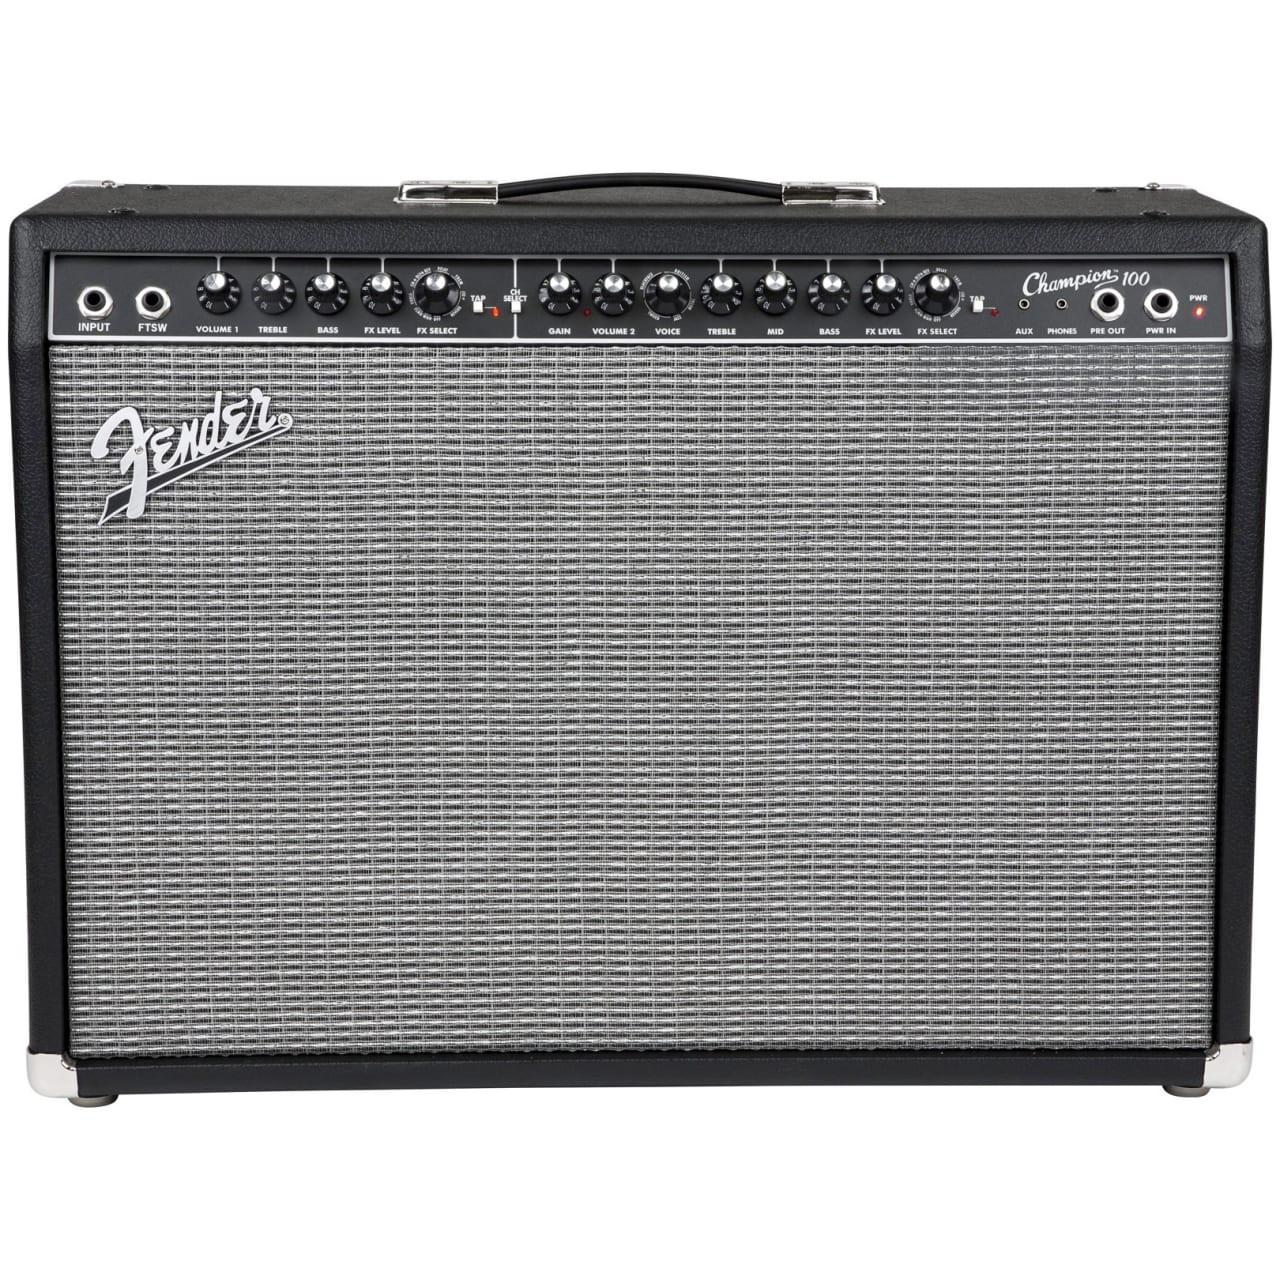 fender champion 100 guitar combo amplifier 100 watts reverb. Black Bedroom Furniture Sets. Home Design Ideas